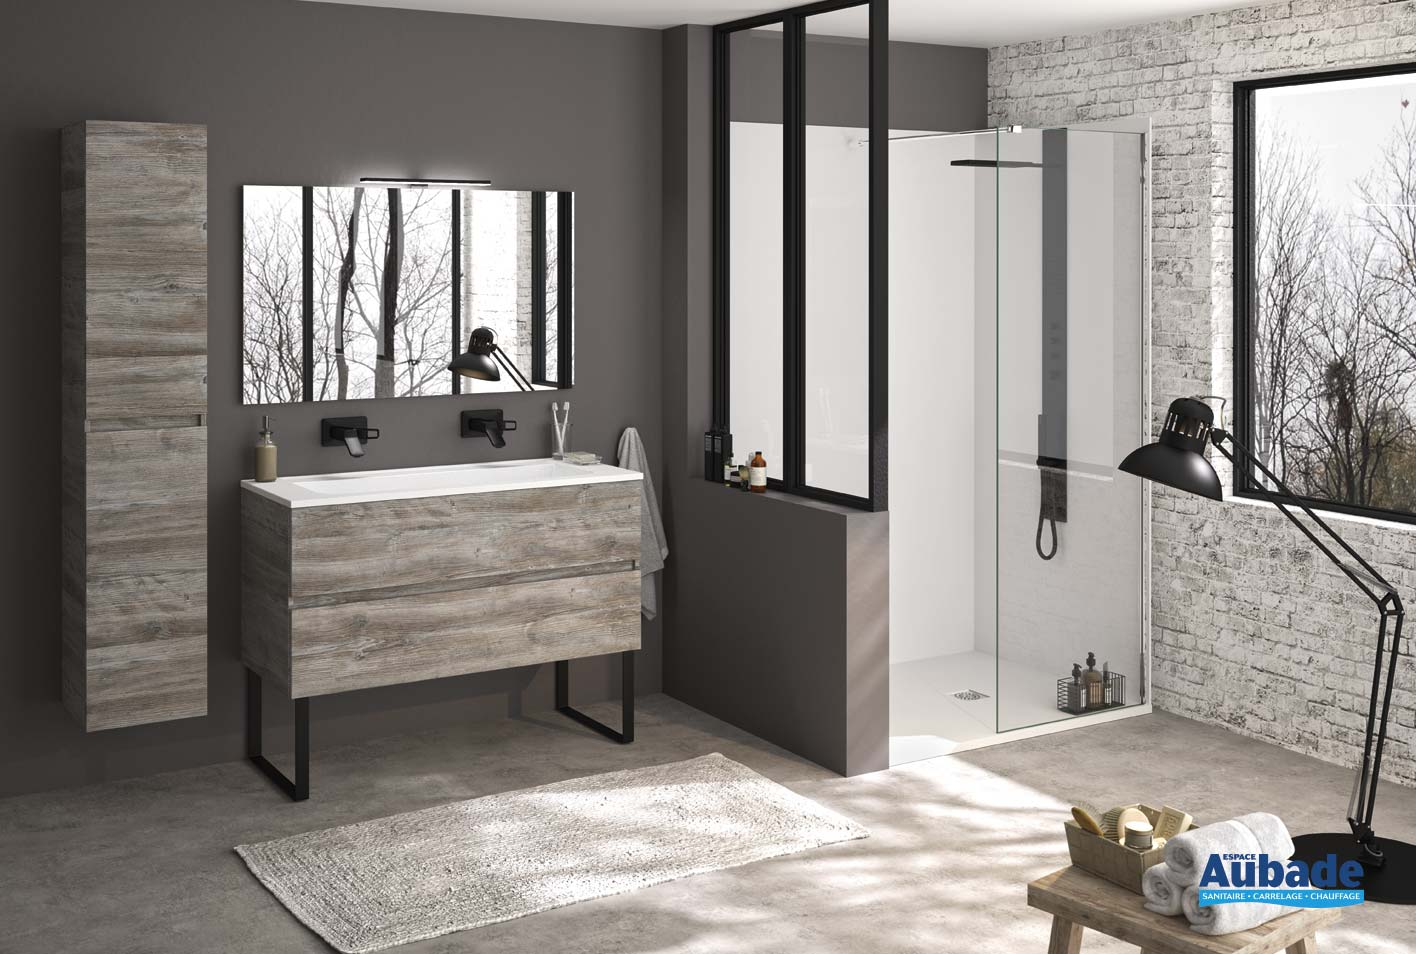 Espace Salle De Bain meuble salle de bain ambiance bain ketty | espace aubade